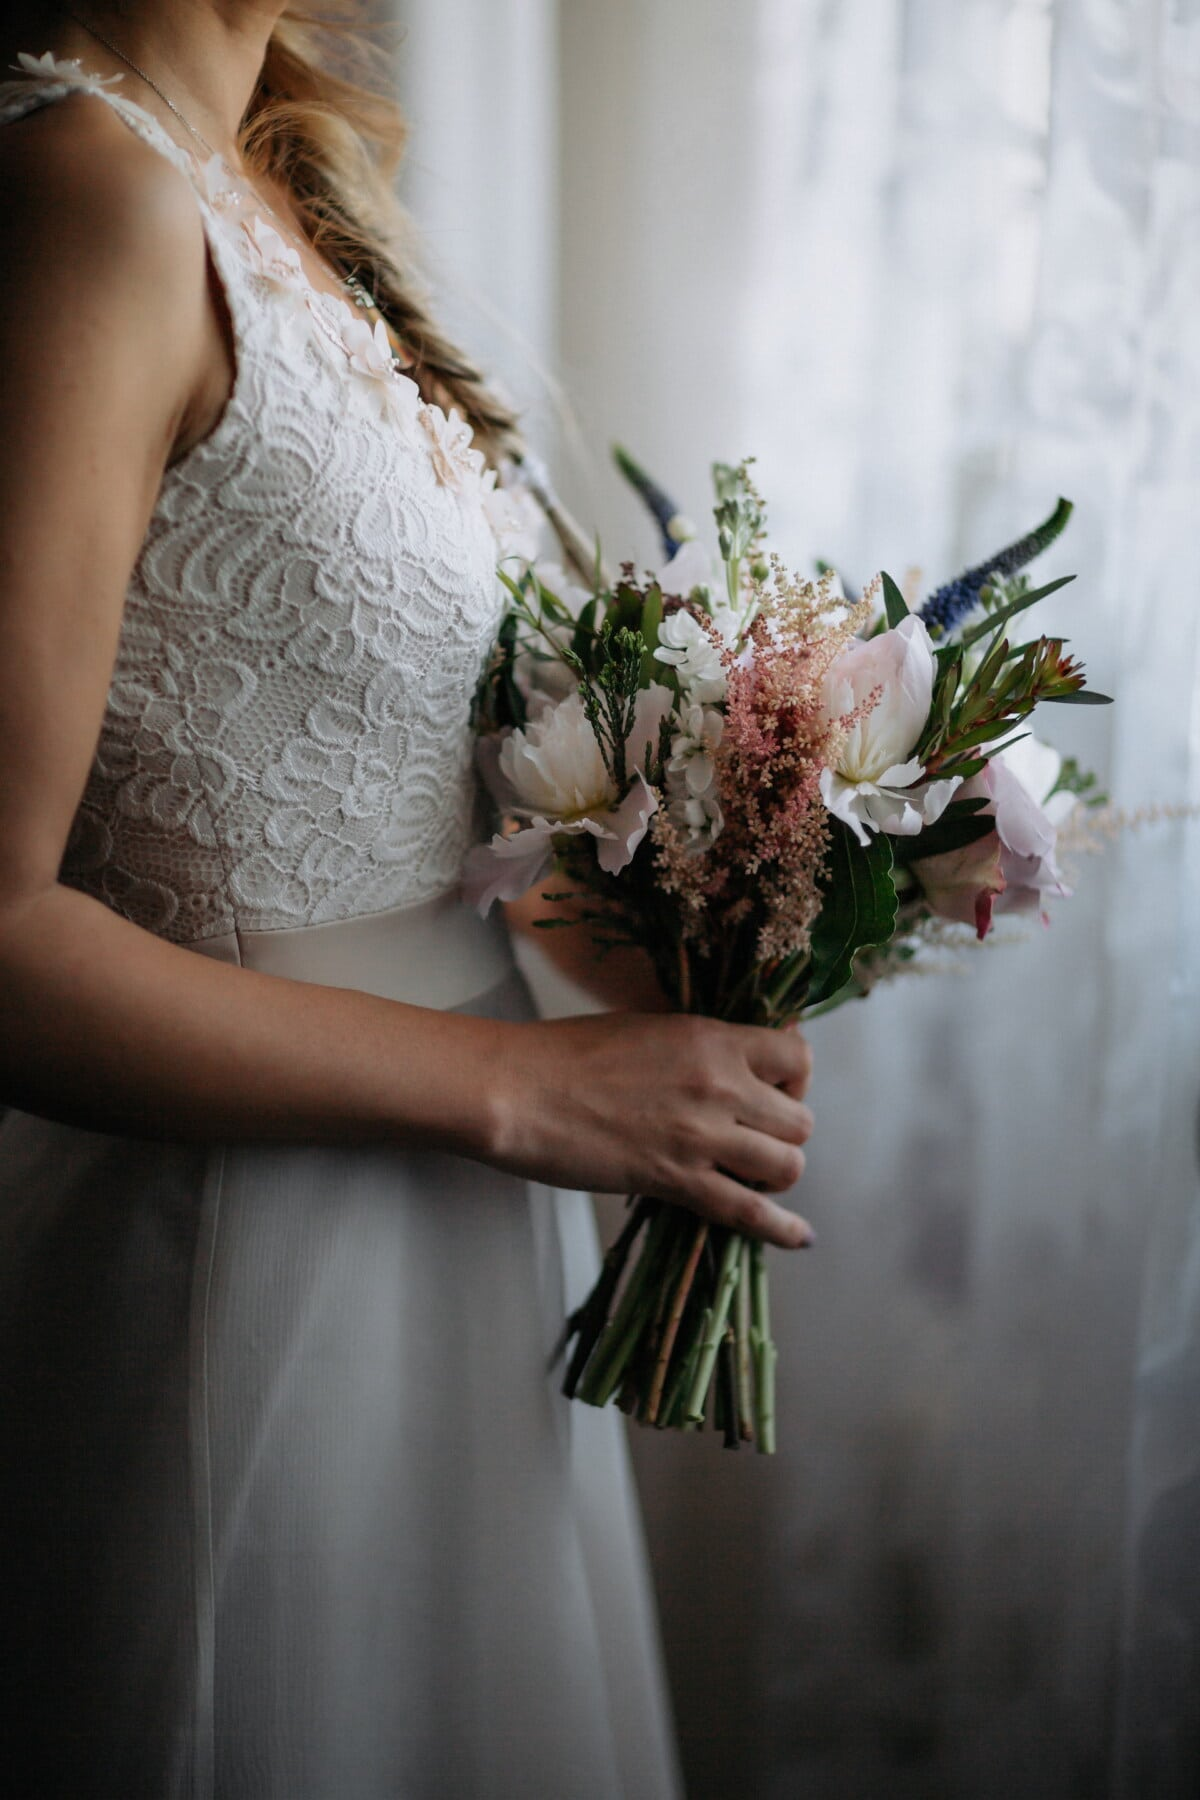 wedding bouquet, wedding dress, standing, bride, blonde hair, side view, decoration, arrangement, groom, wedding